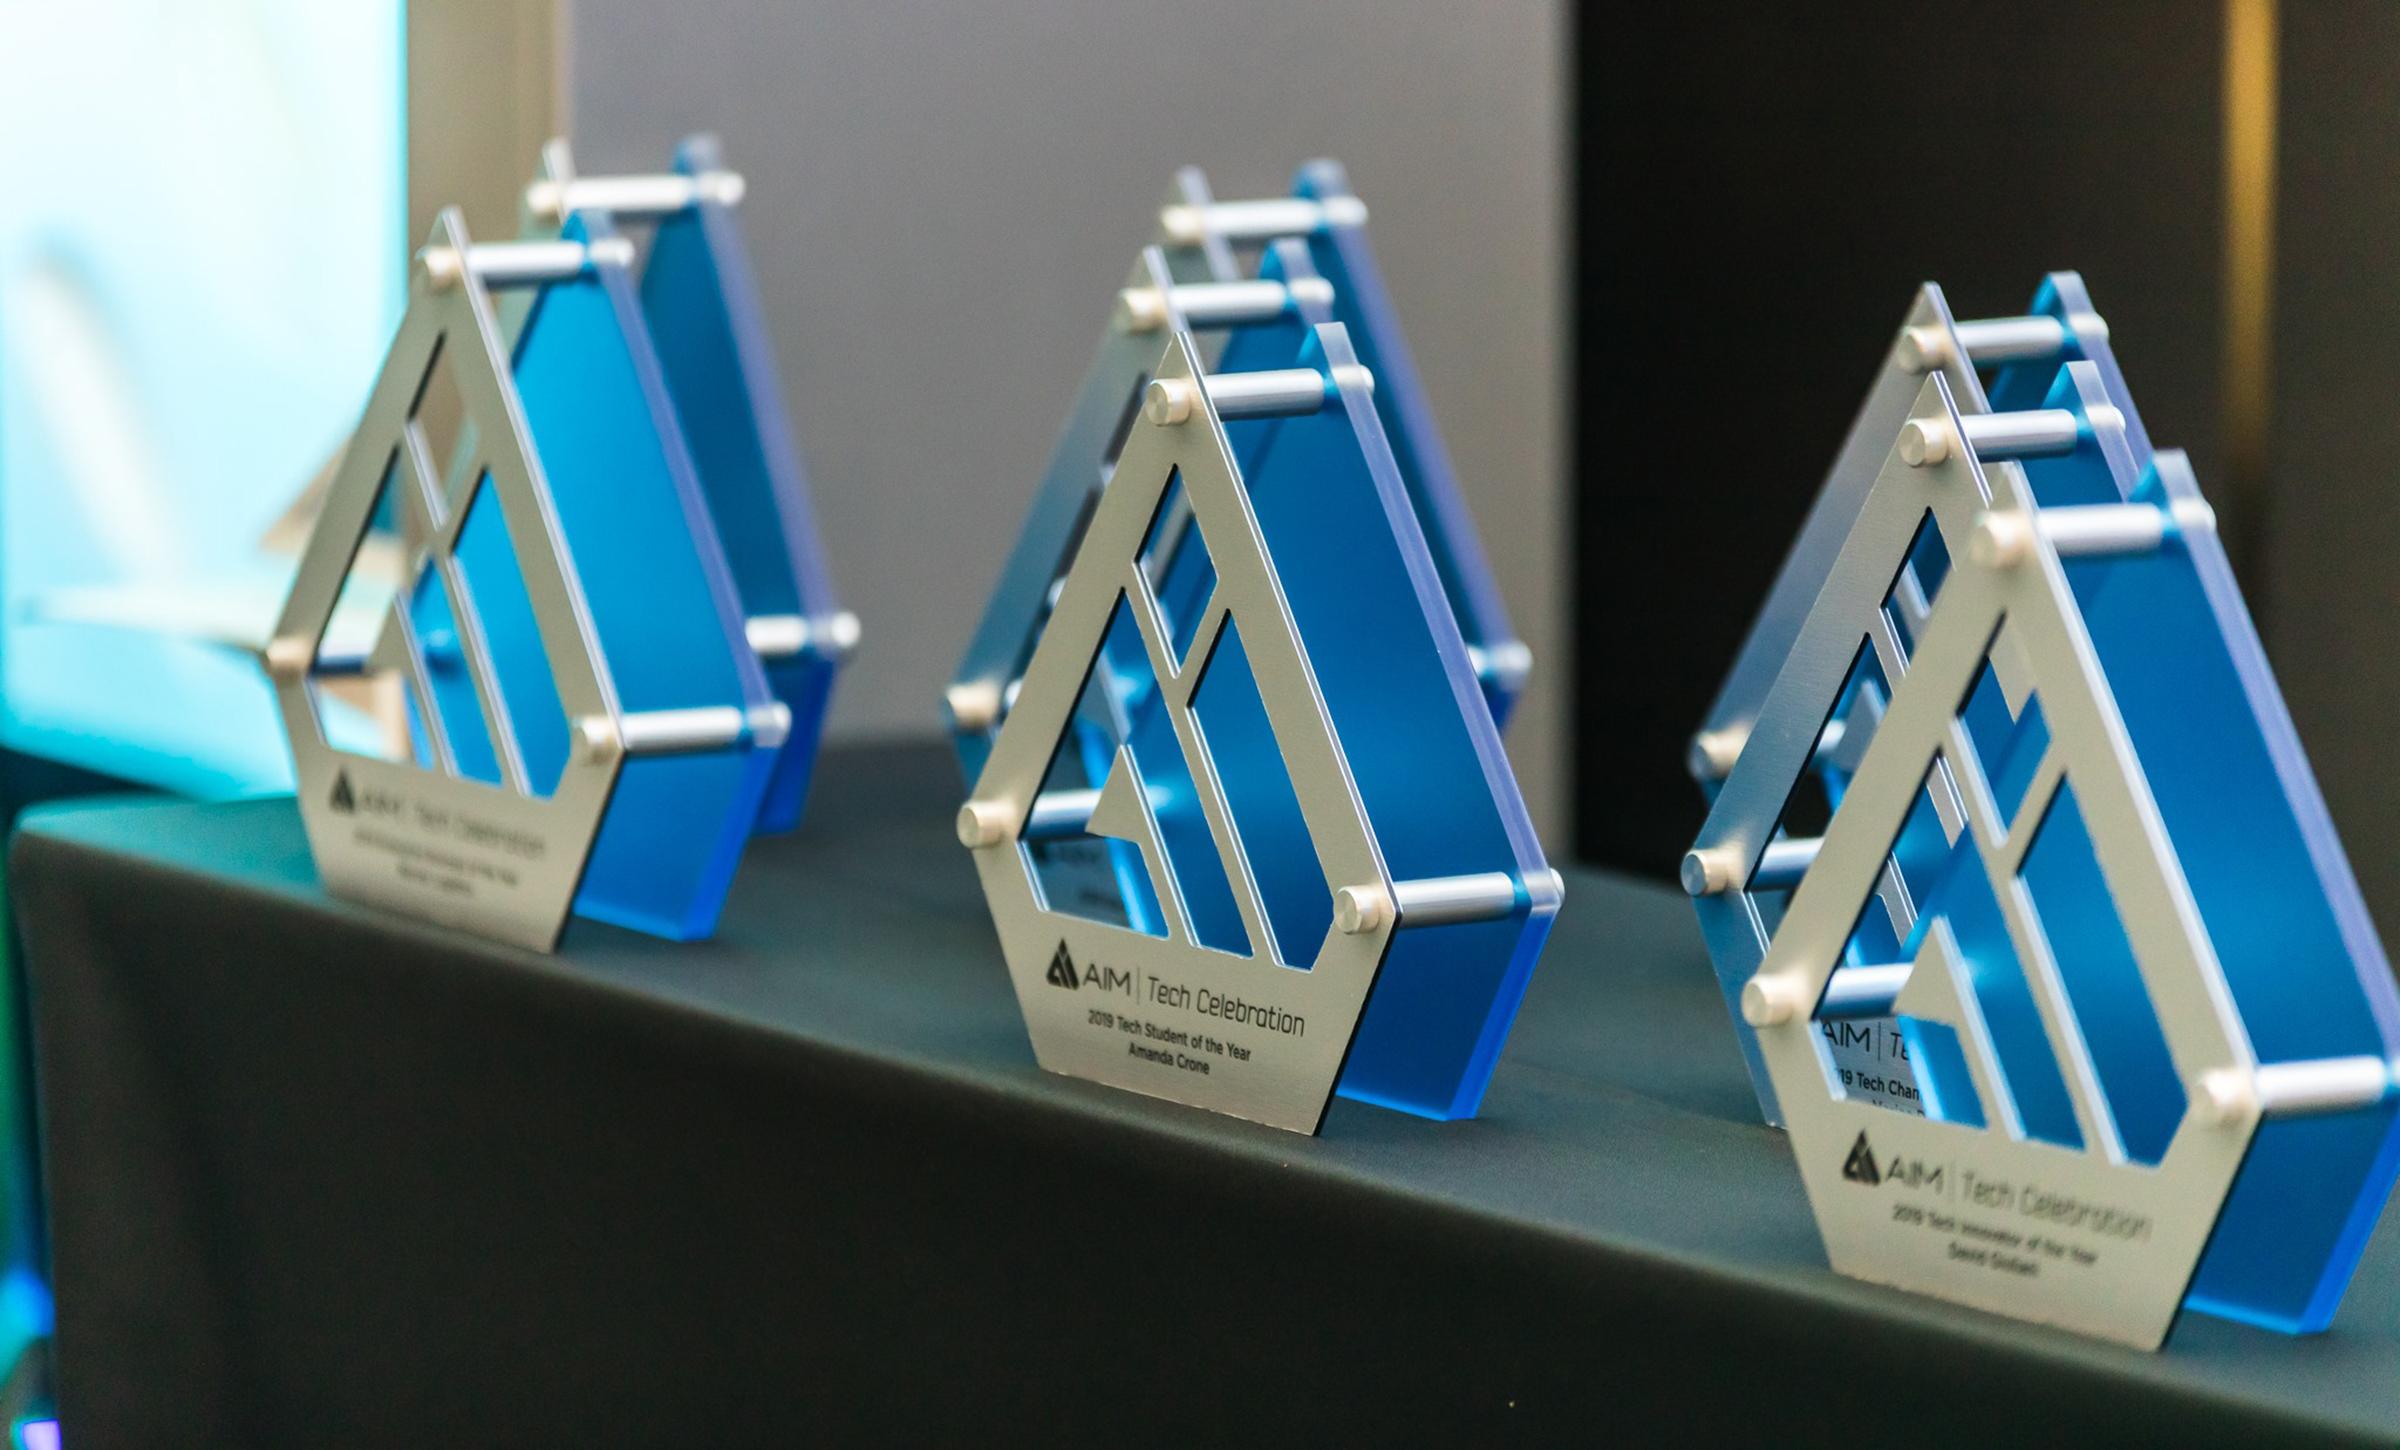 Awards wait for their presentation at the AIM Tech Celebration on Thursday, Nov. 14, 2019. (Courtesy AIM)